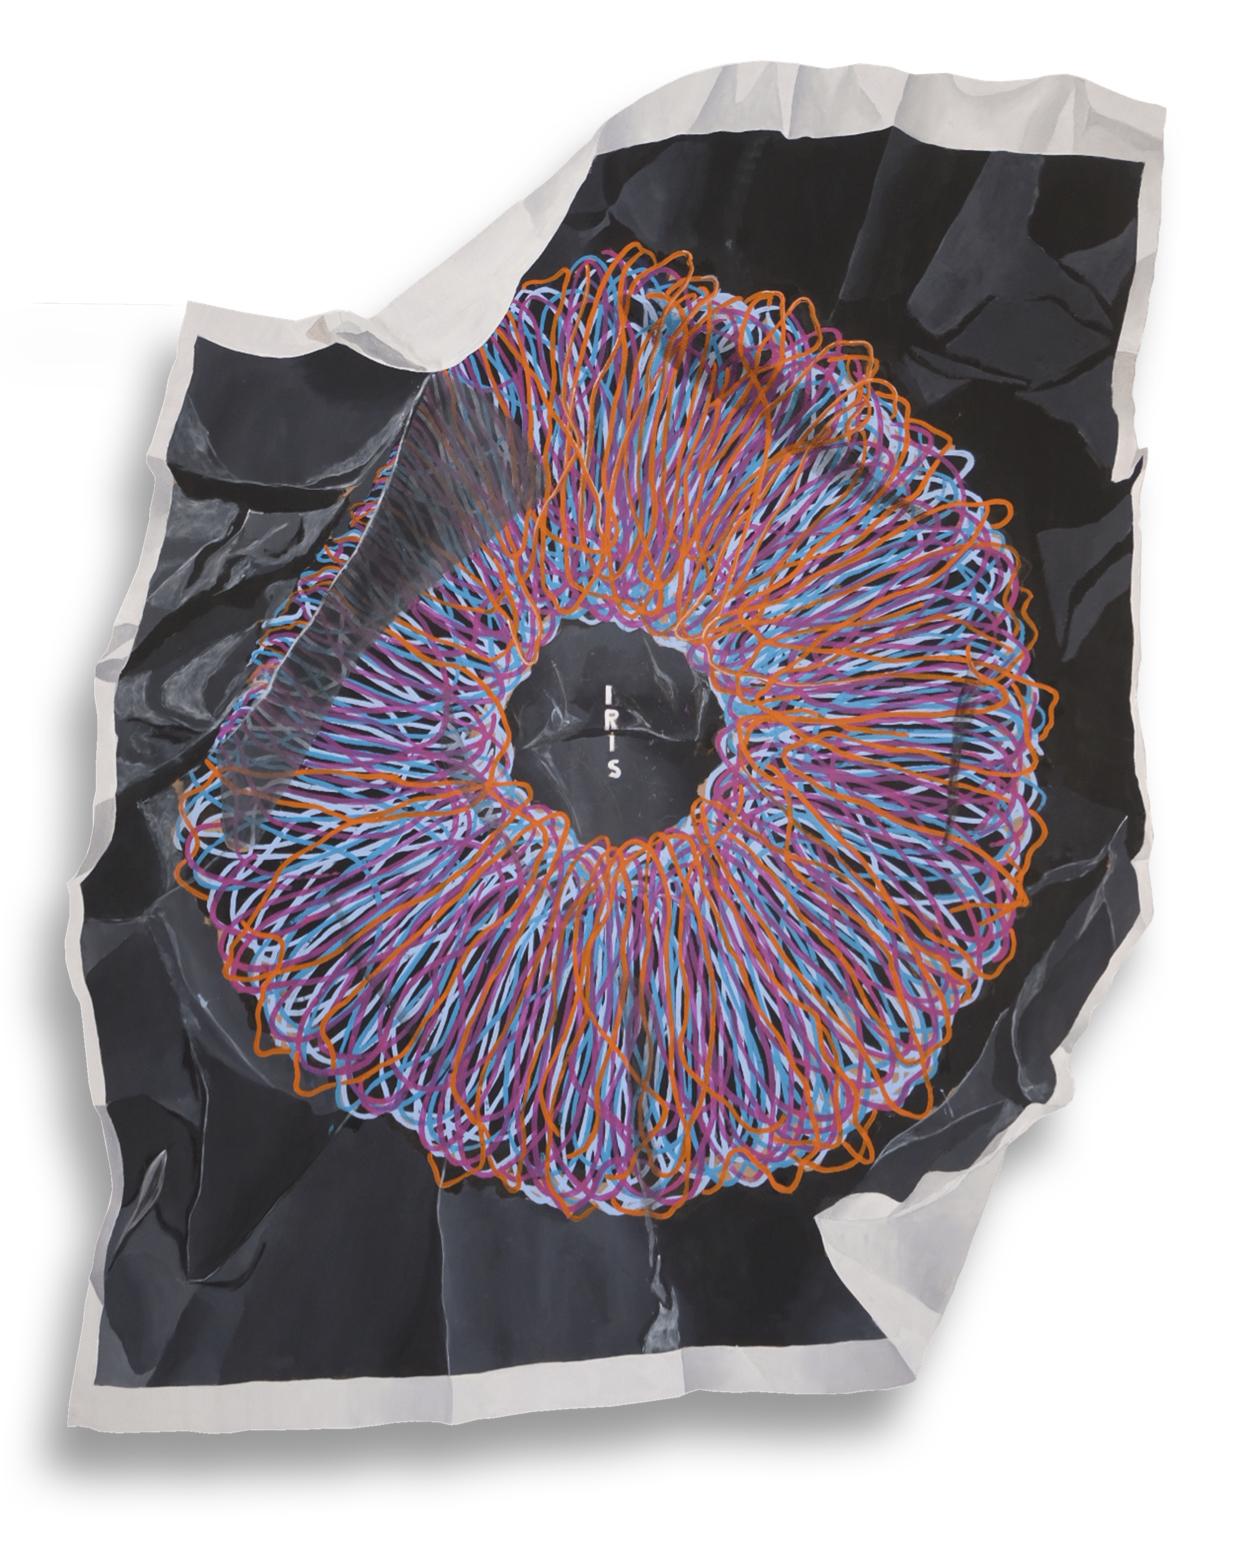 Iris - 2020 - Collaboration with Alex Spoettel (MediaDesign) - 160cm x 150cm